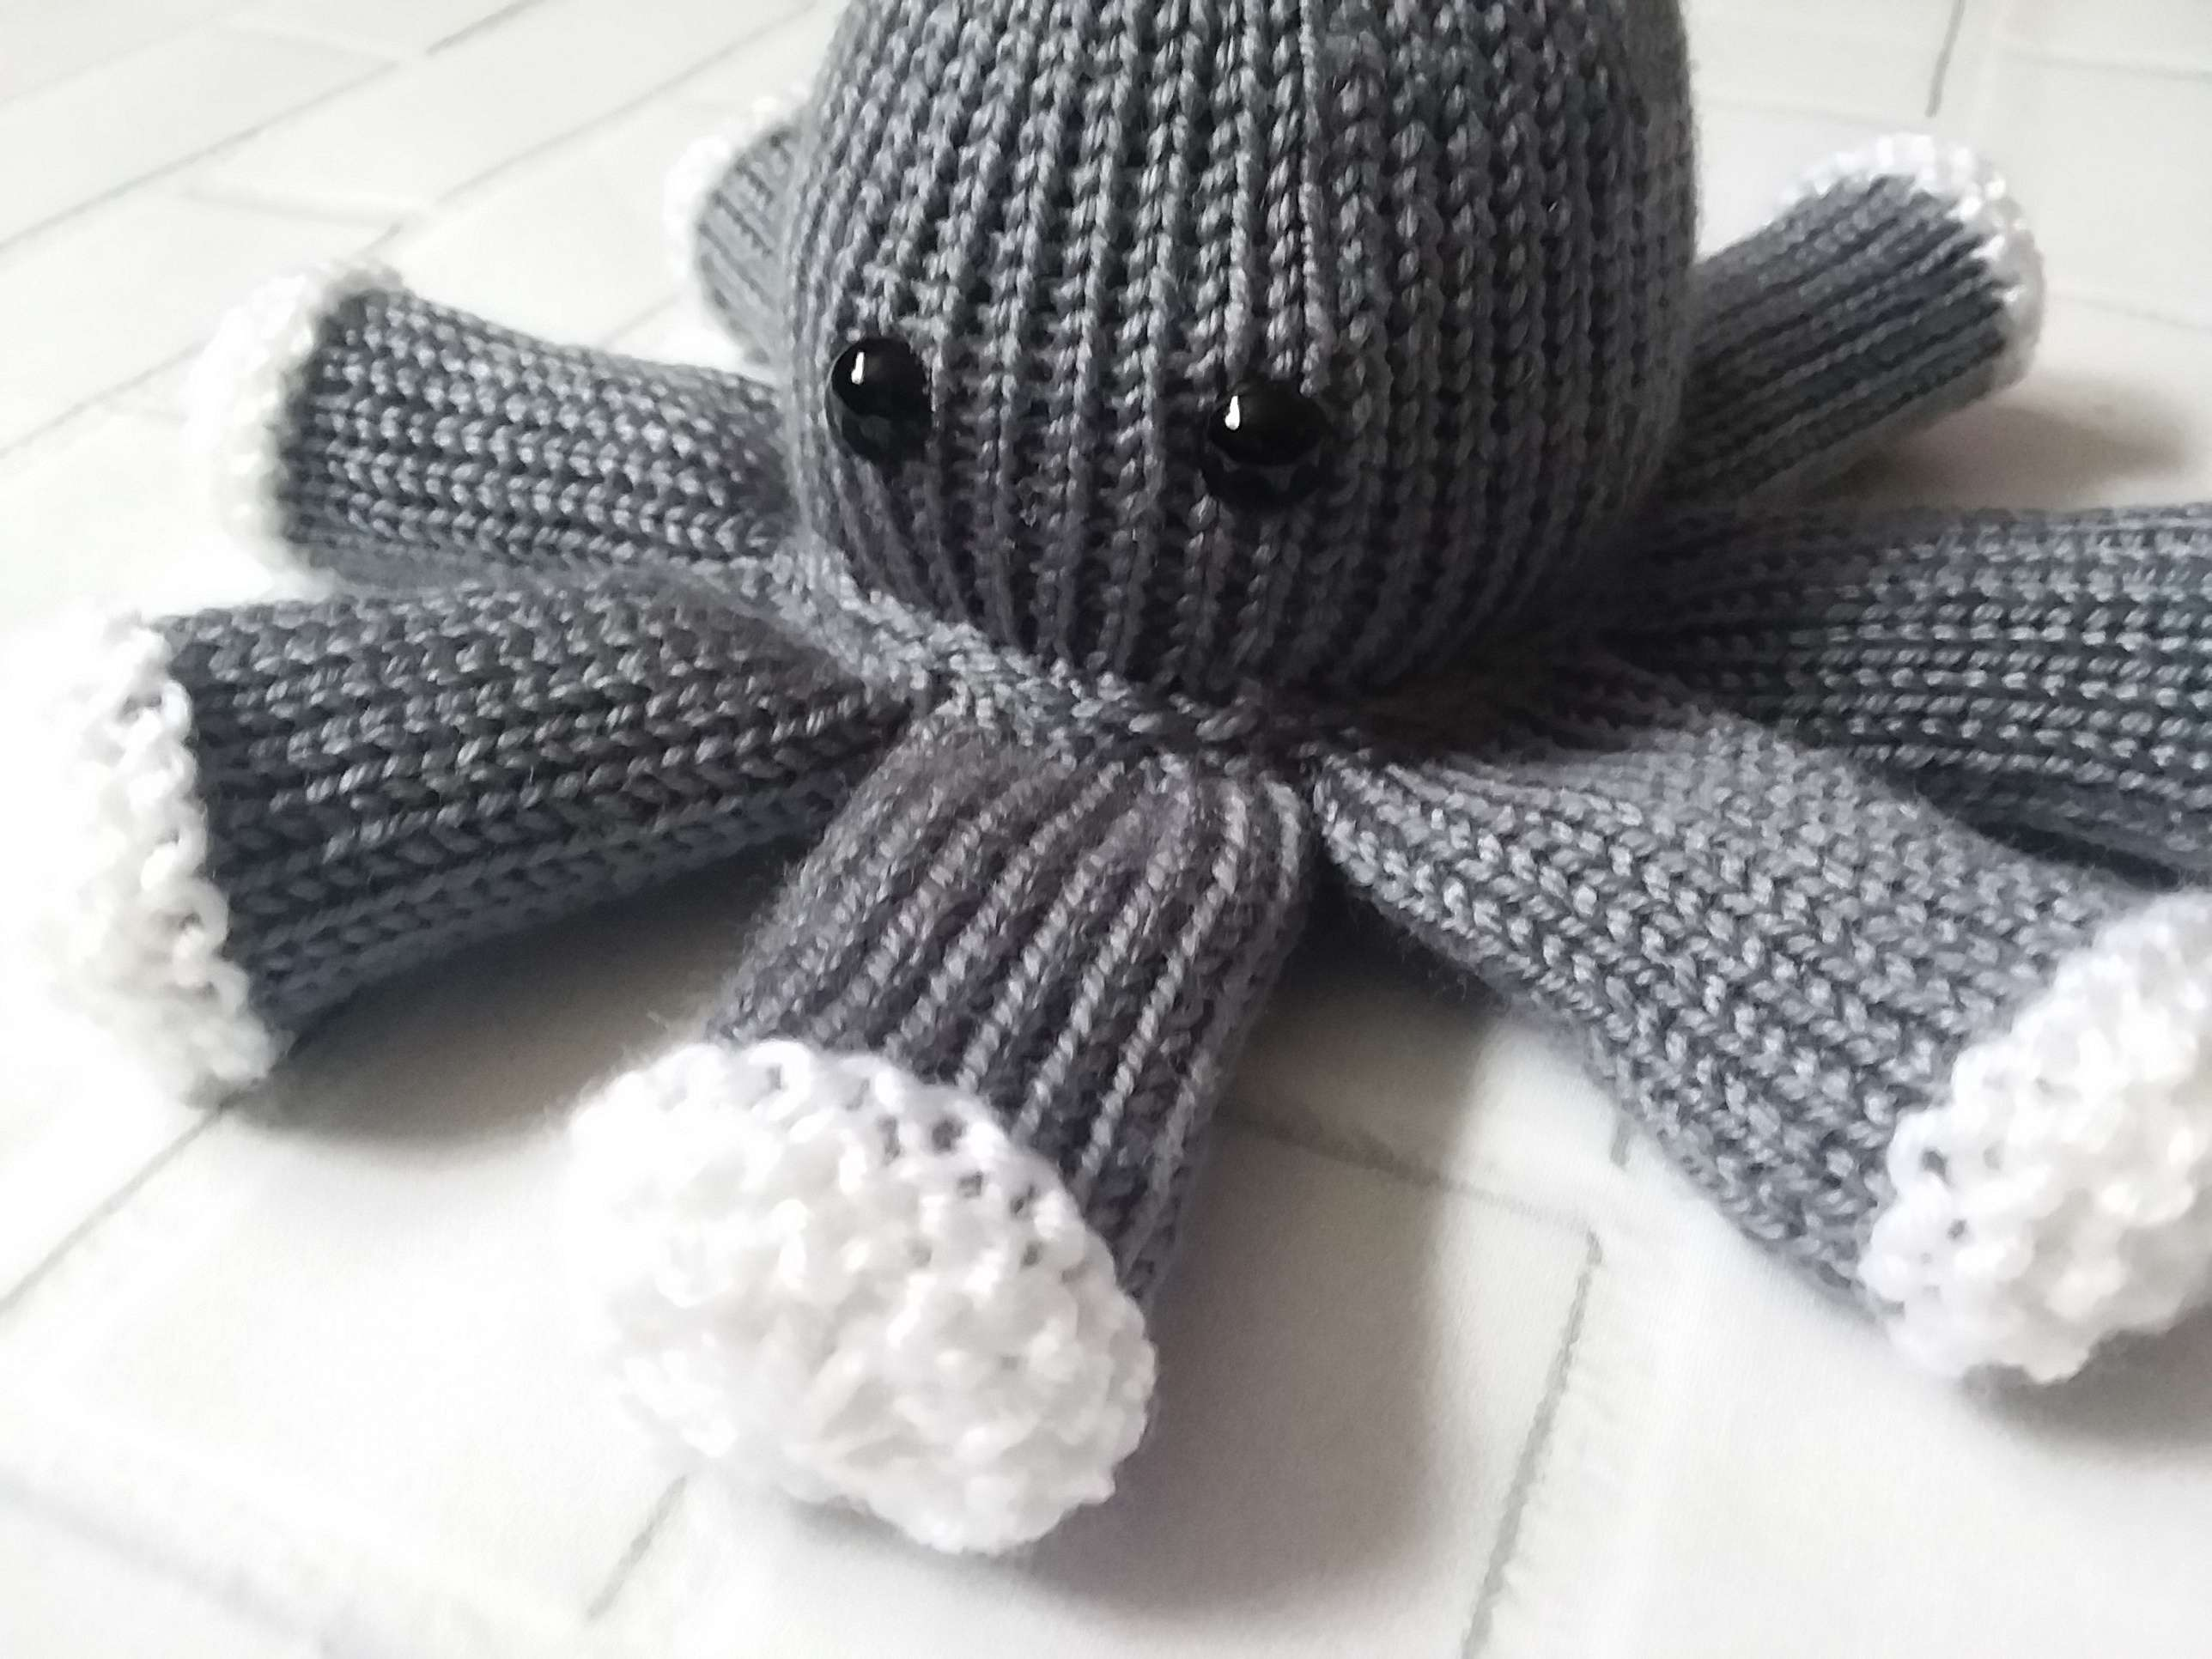 'Little' Octopus